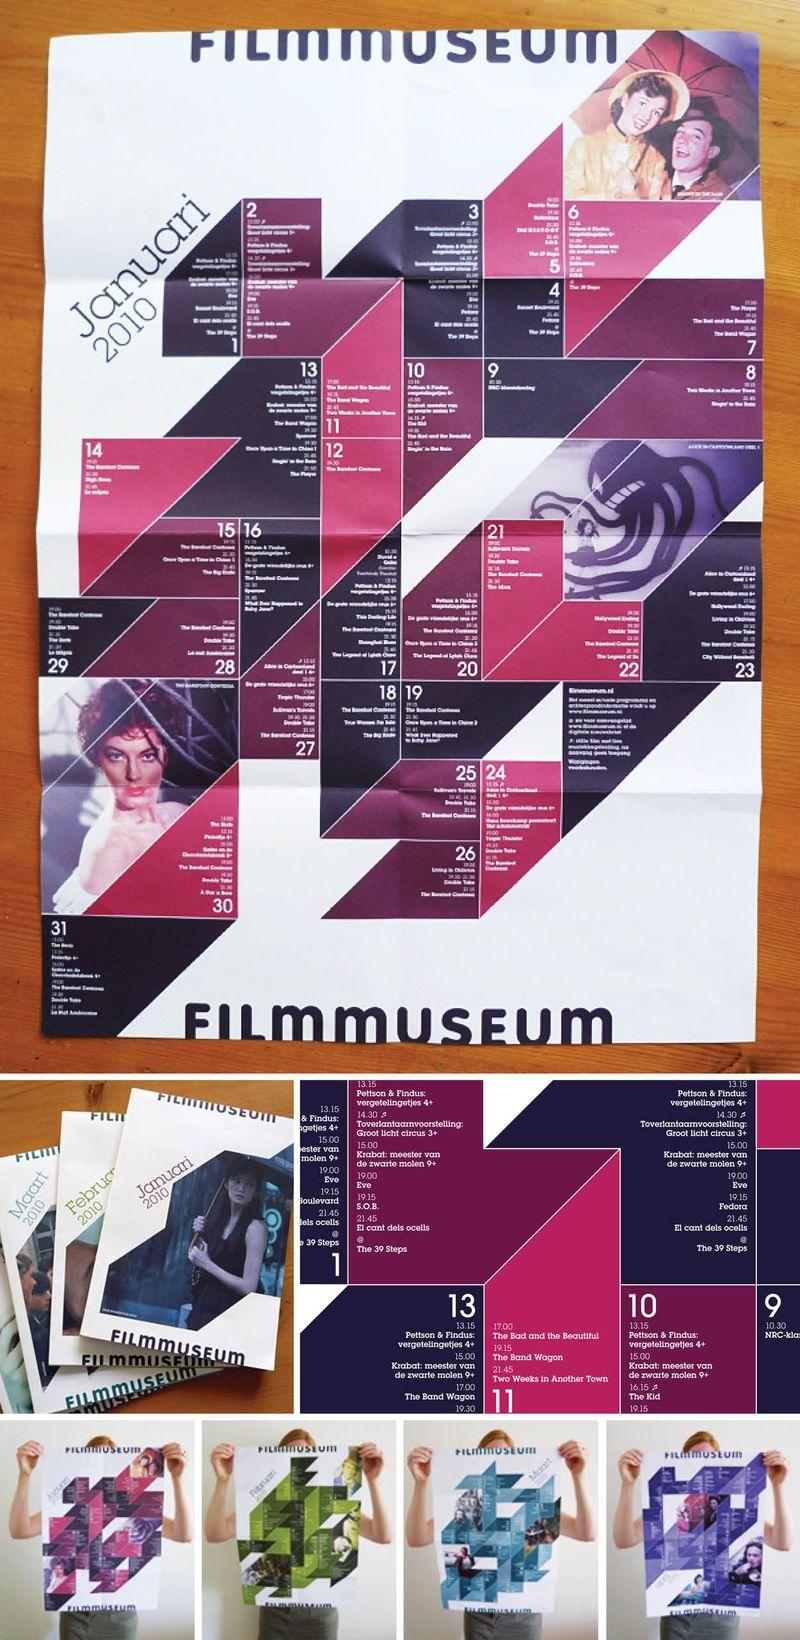 FilmMuseum_RPRKR